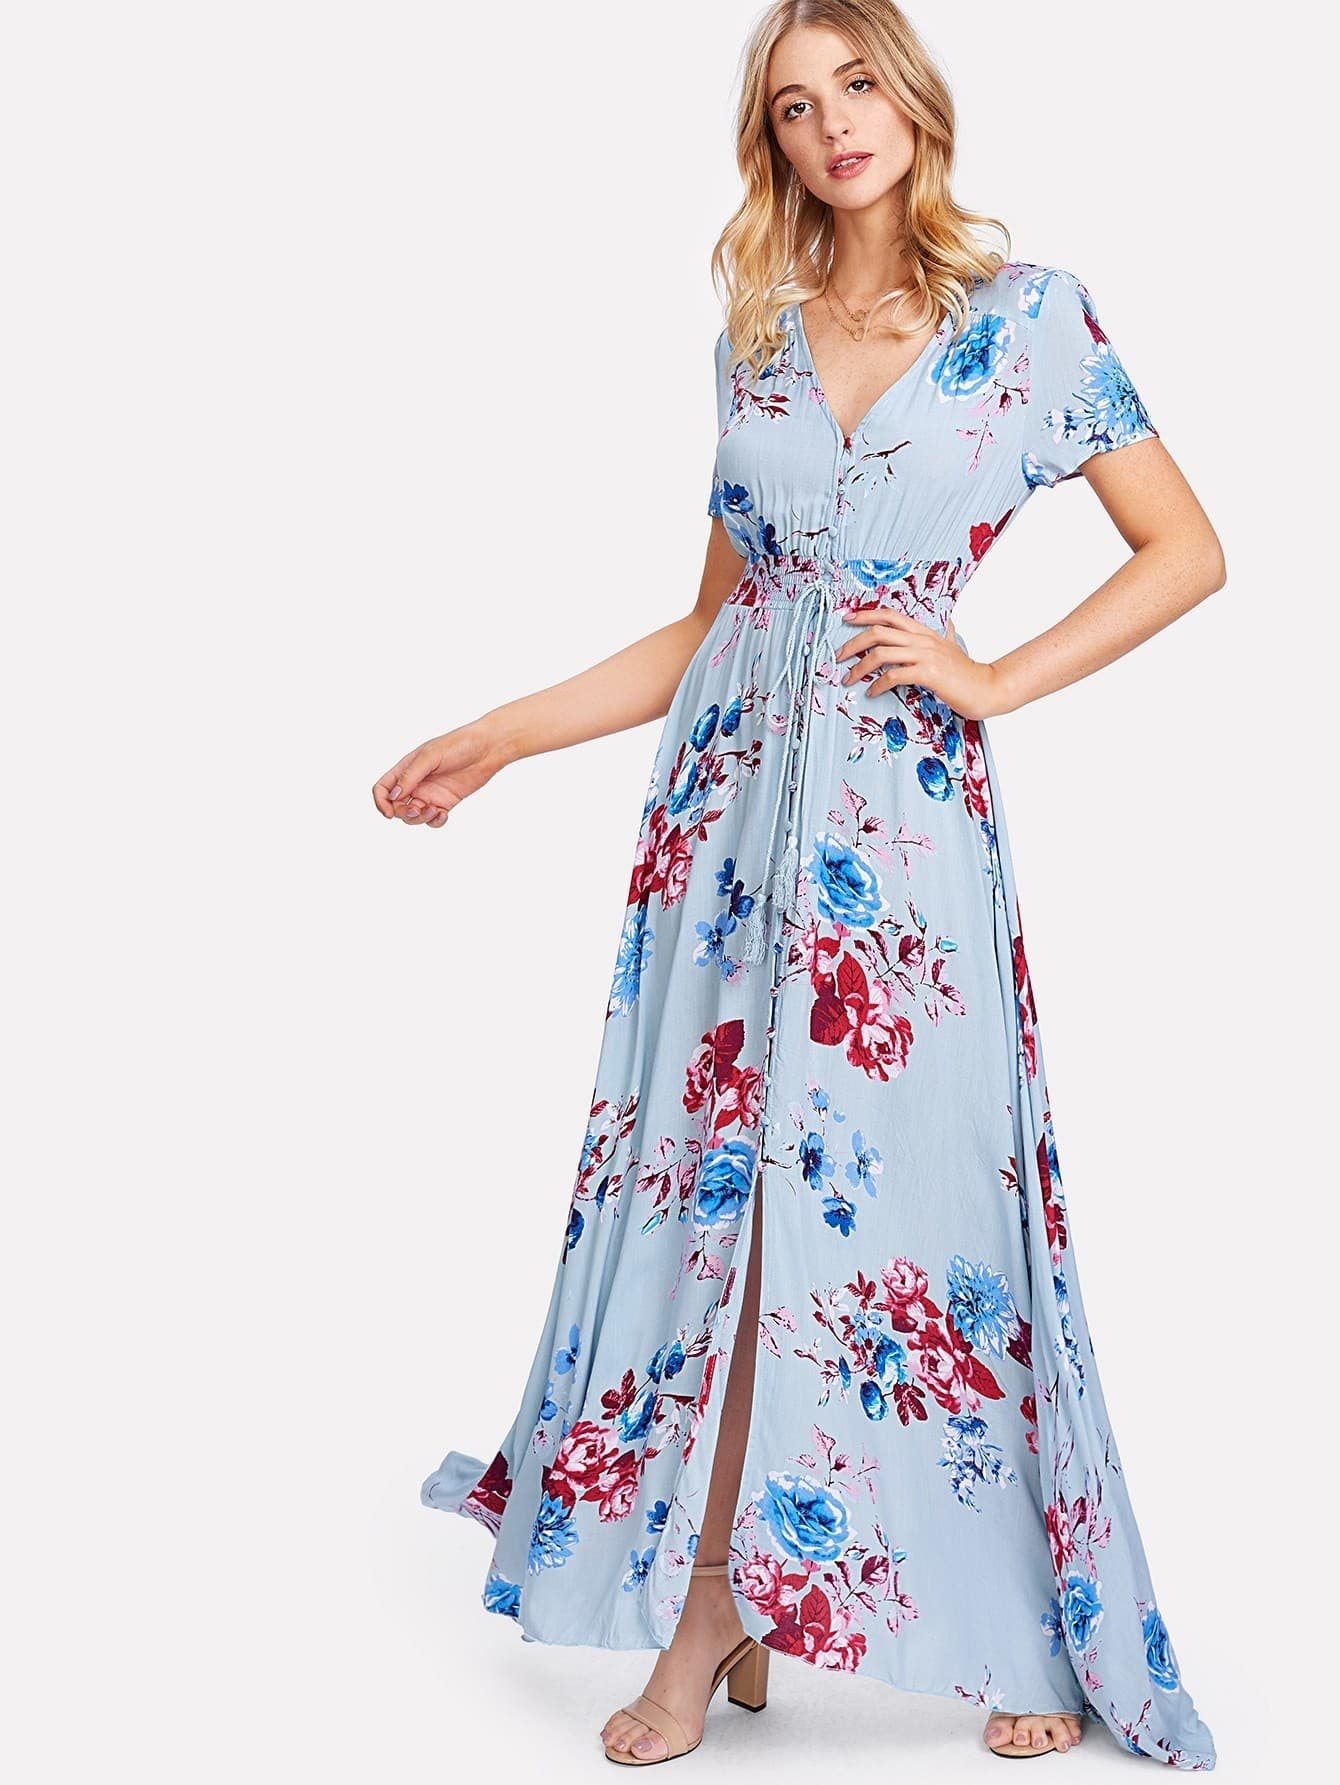 Button Up Front Tassel Tied Floral Dress Shein Sheinside